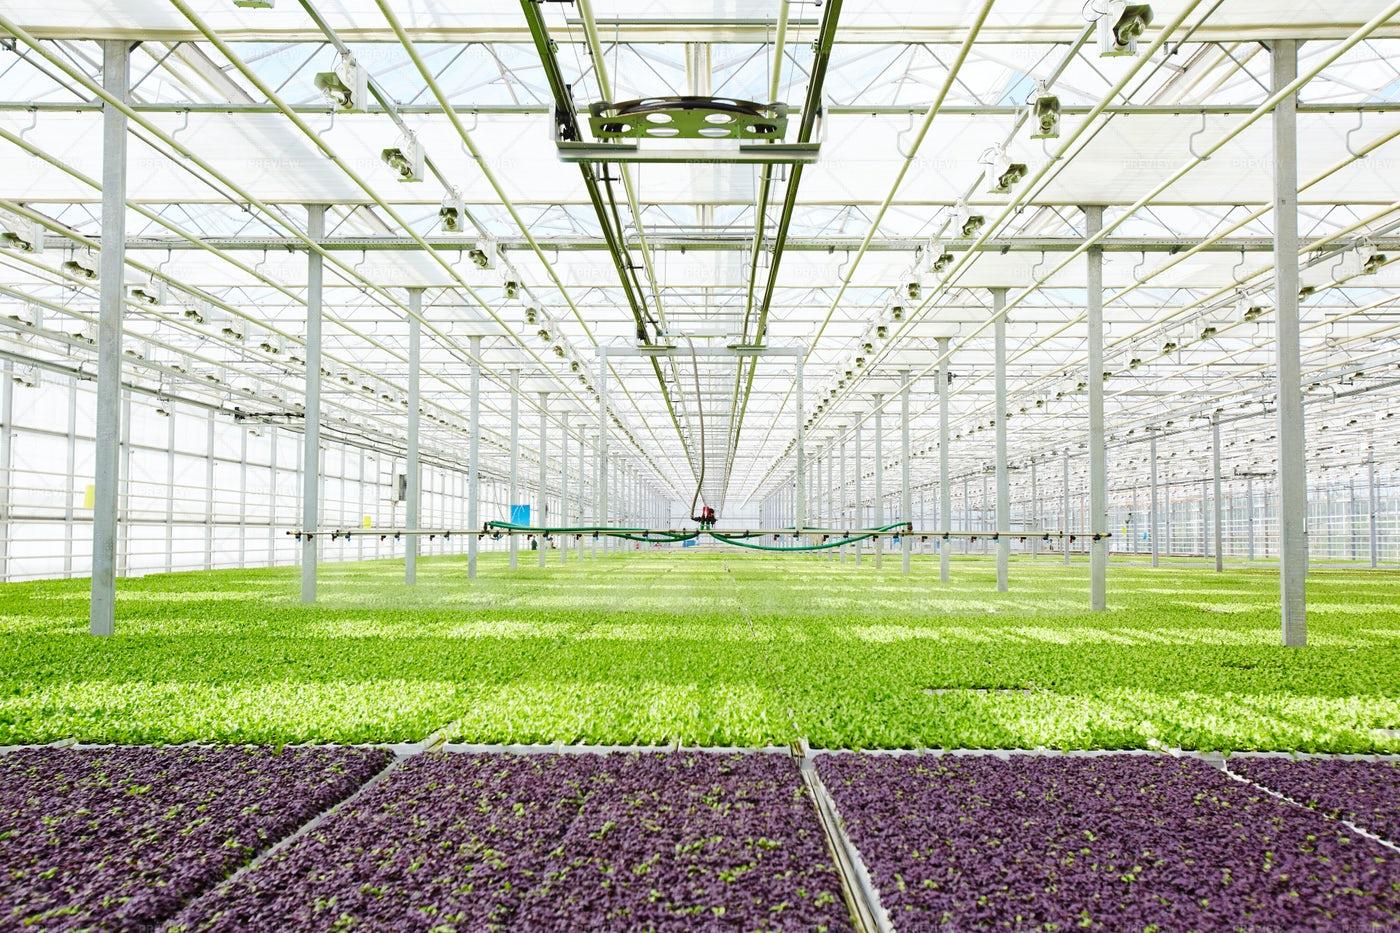 Seedlings In Glasshouse: Stock Photos